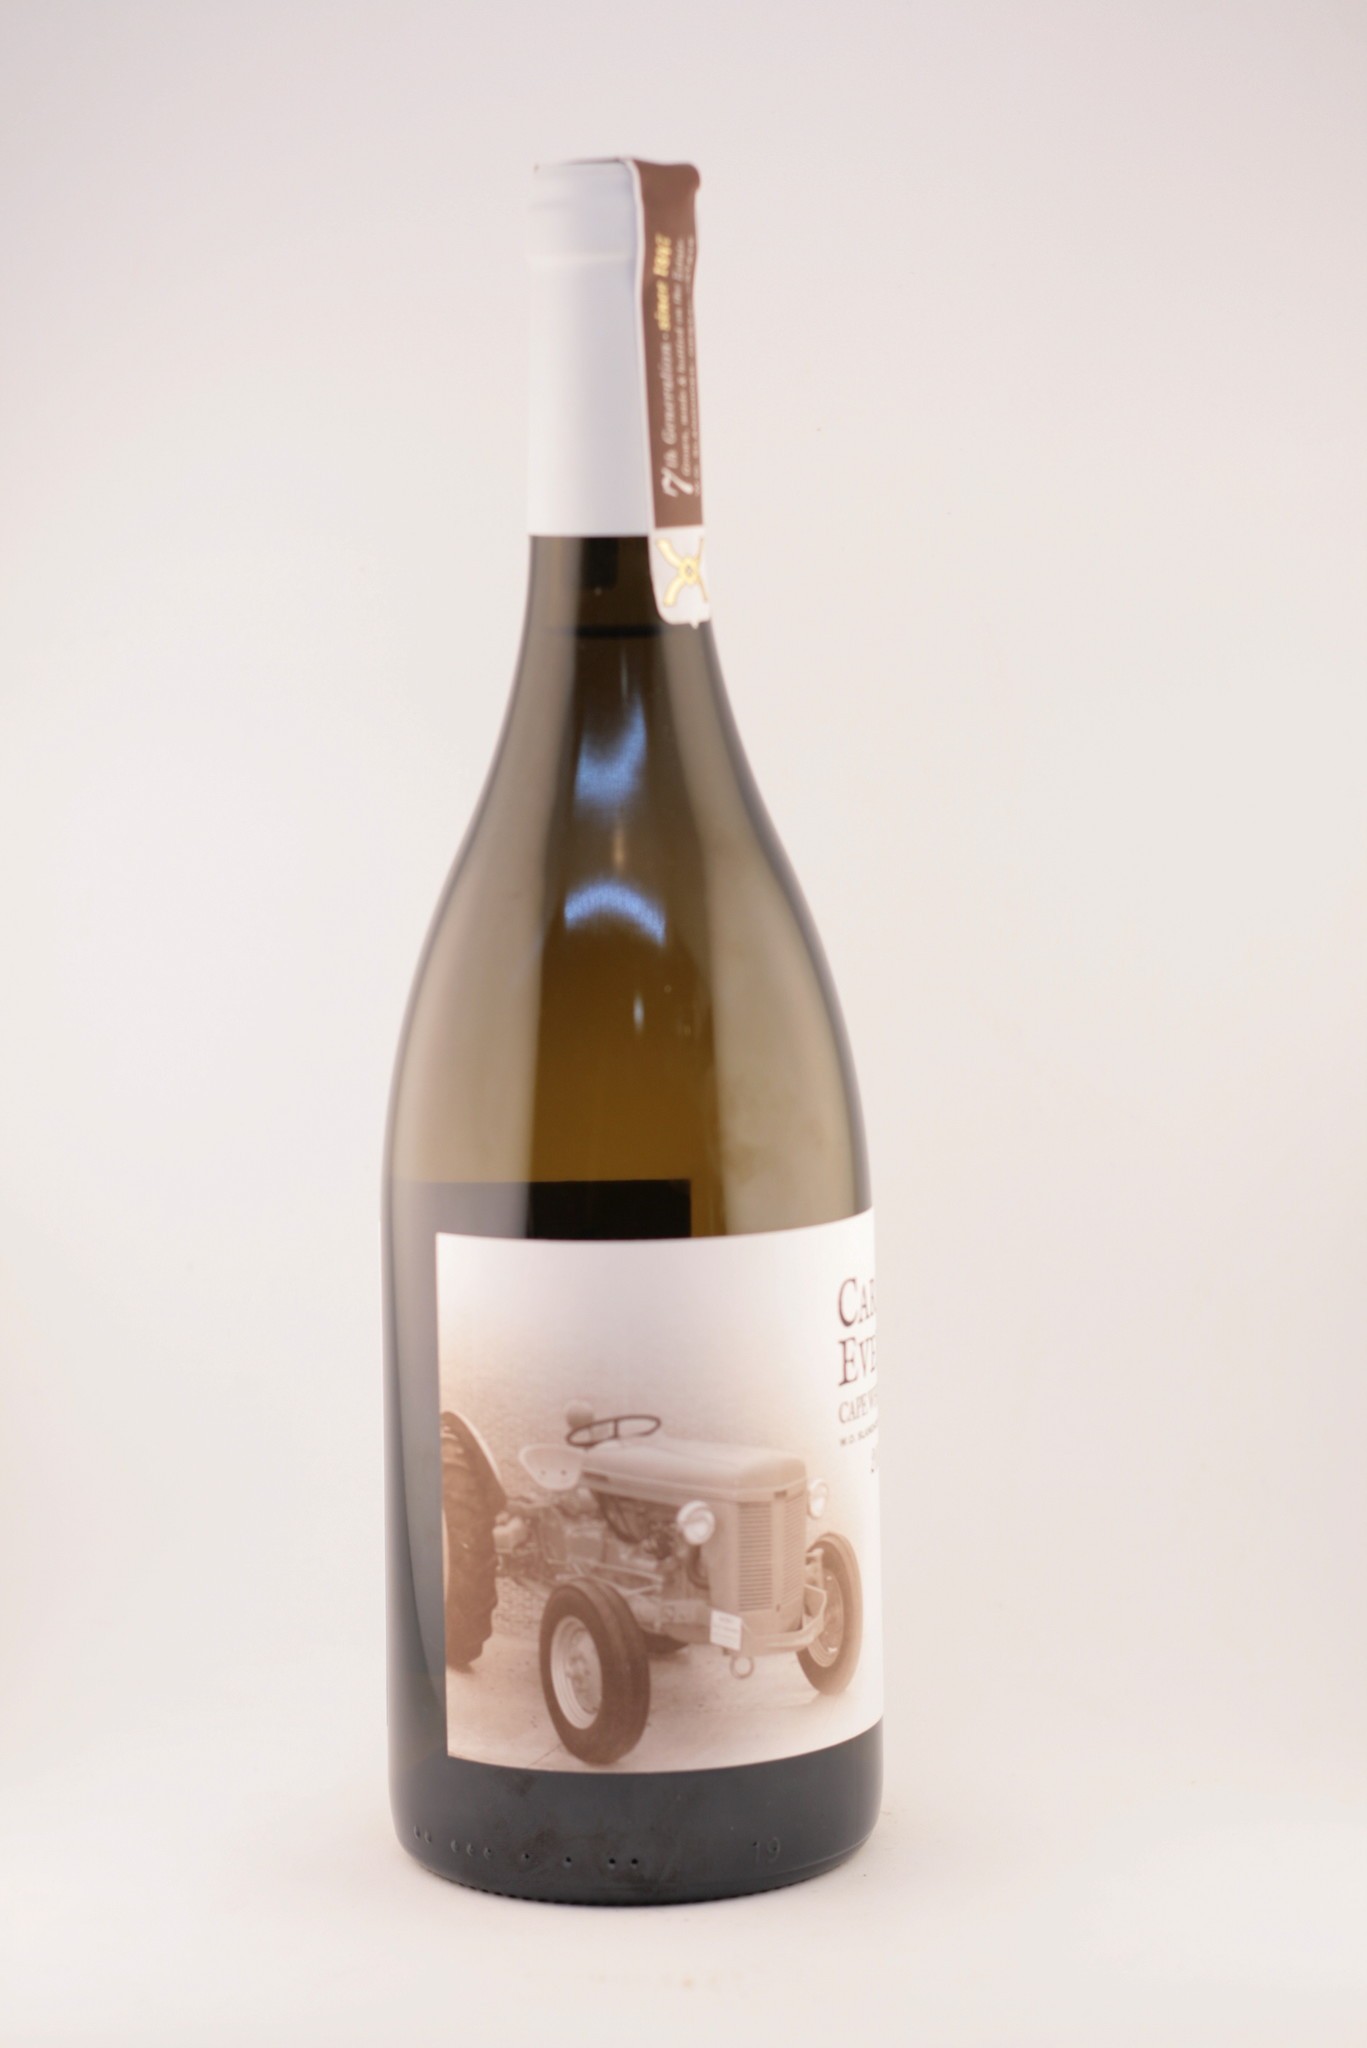 Heritage Rang Cape blend wit |  Carl Everson | Opstal Winery  | Cape blend | Slanghoek | 2017